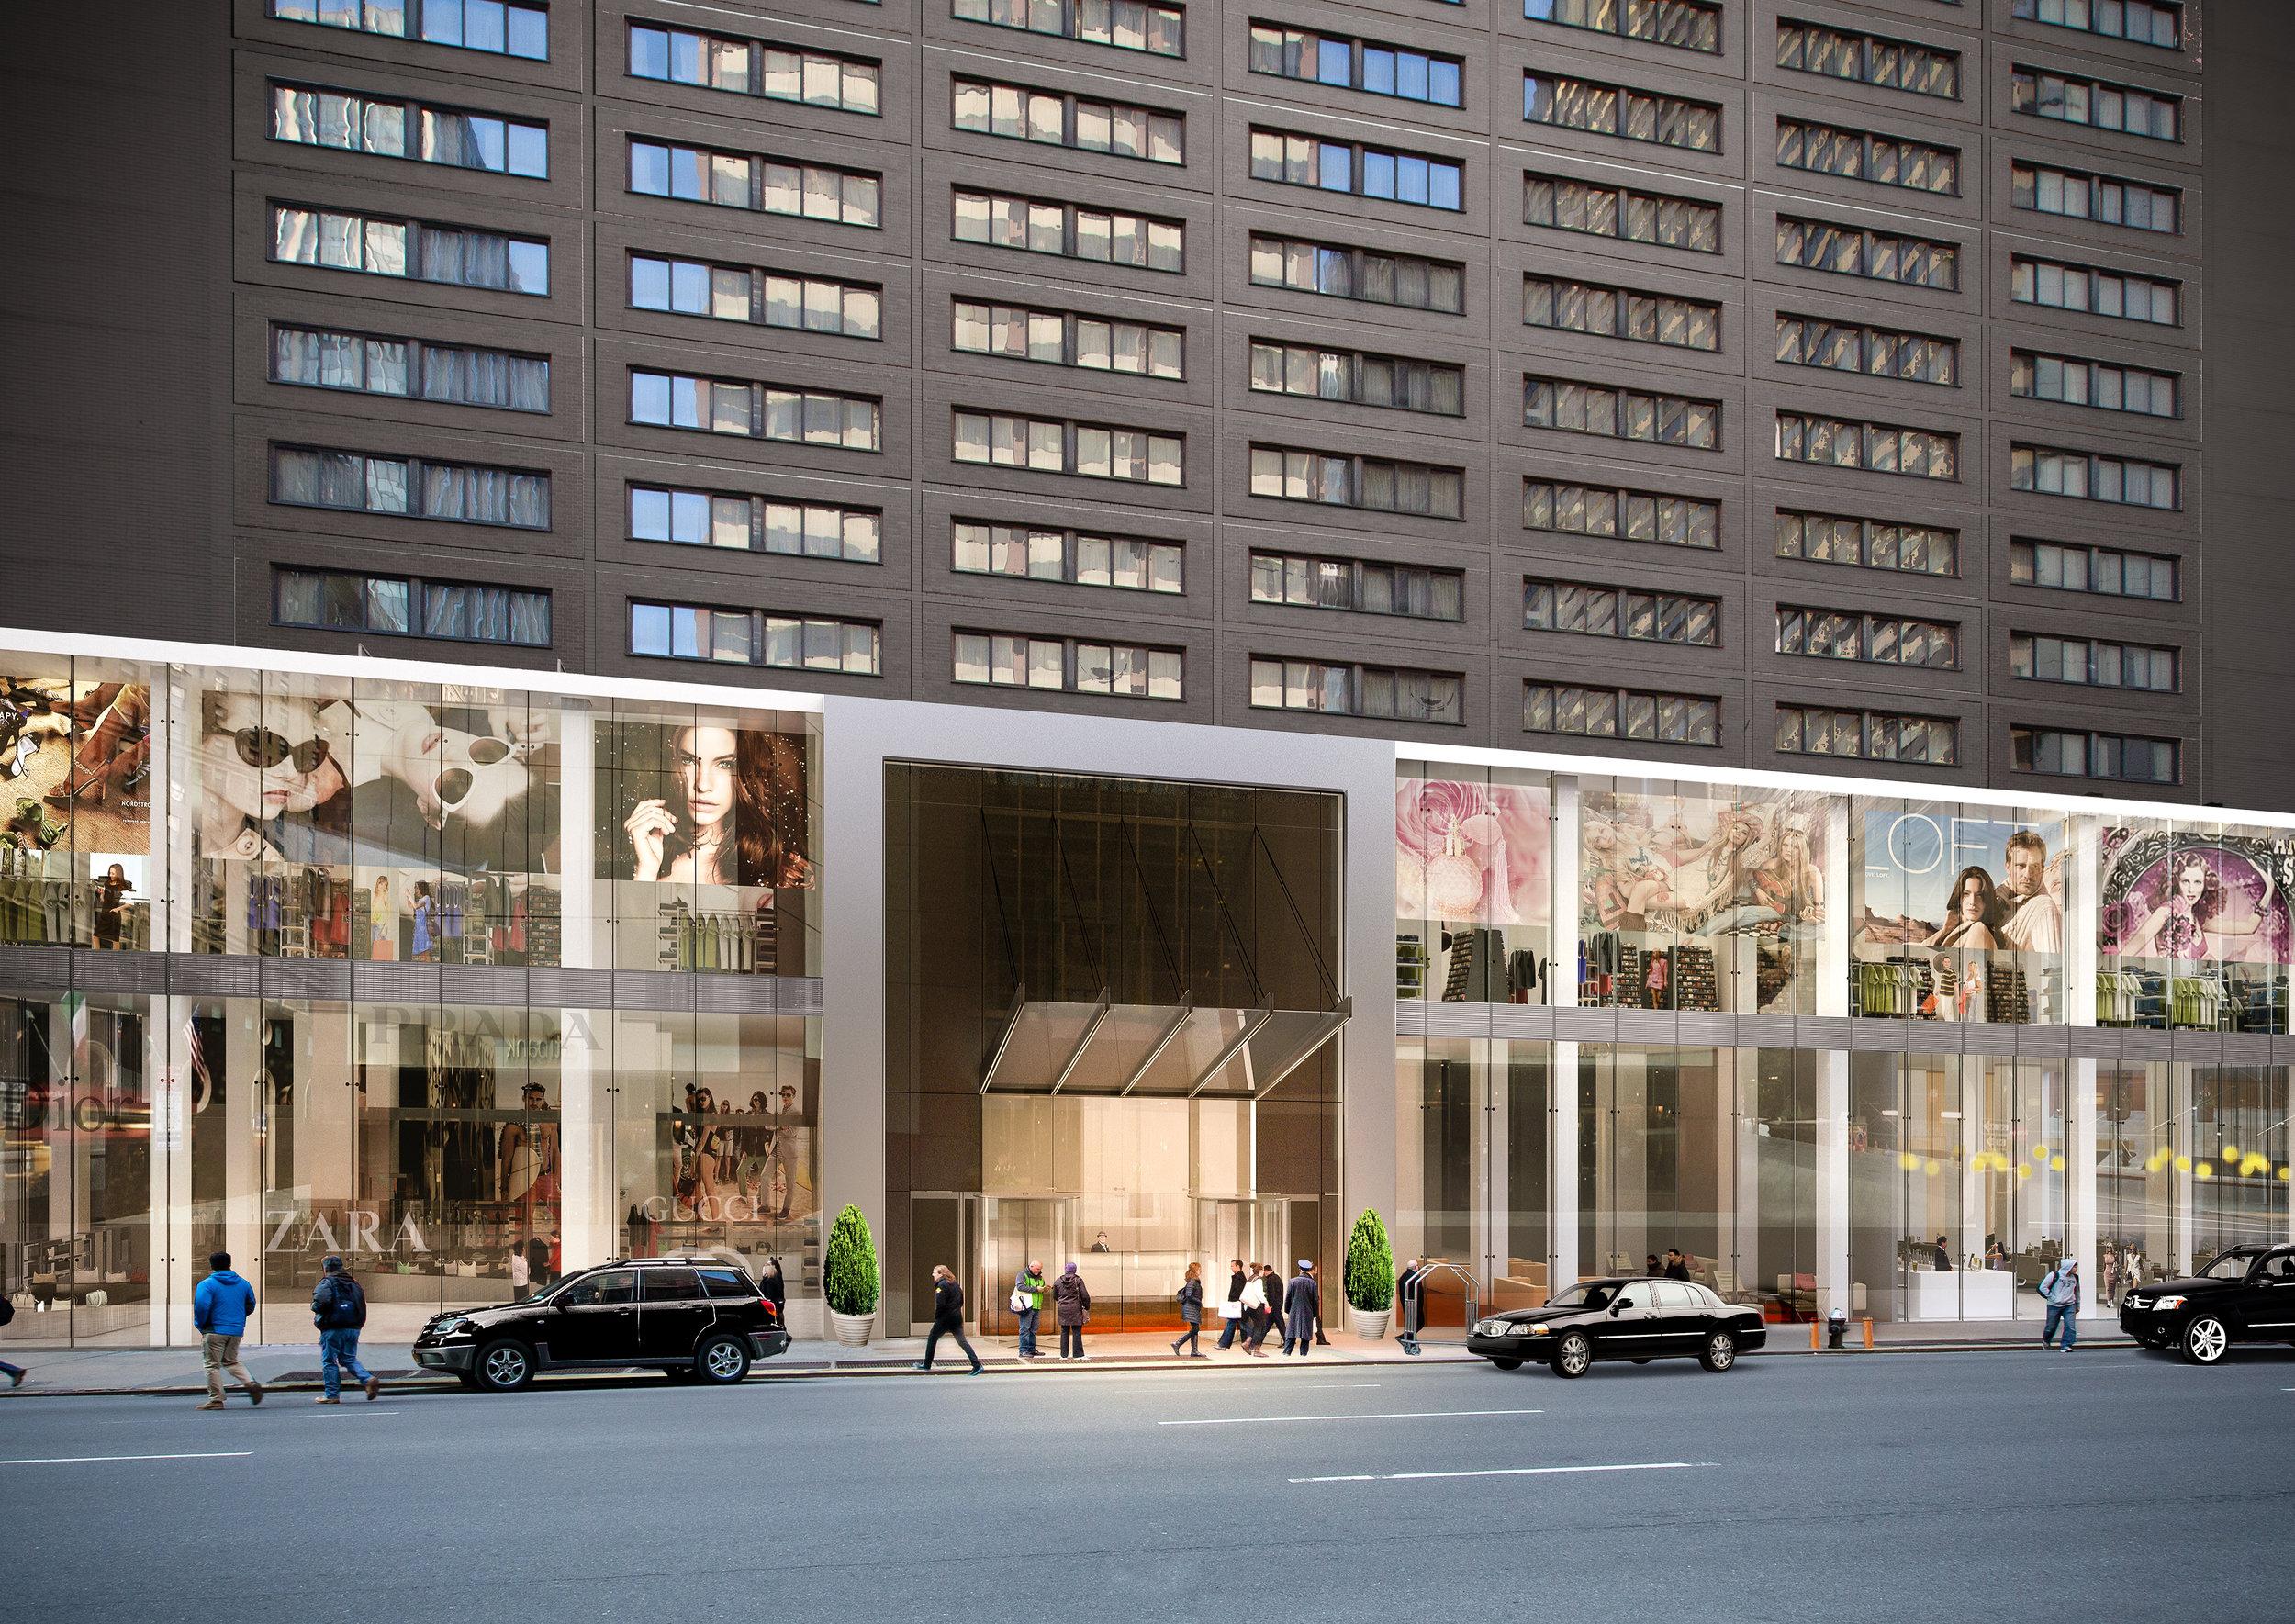 NYC Retail Facade Proposal - Opt 3